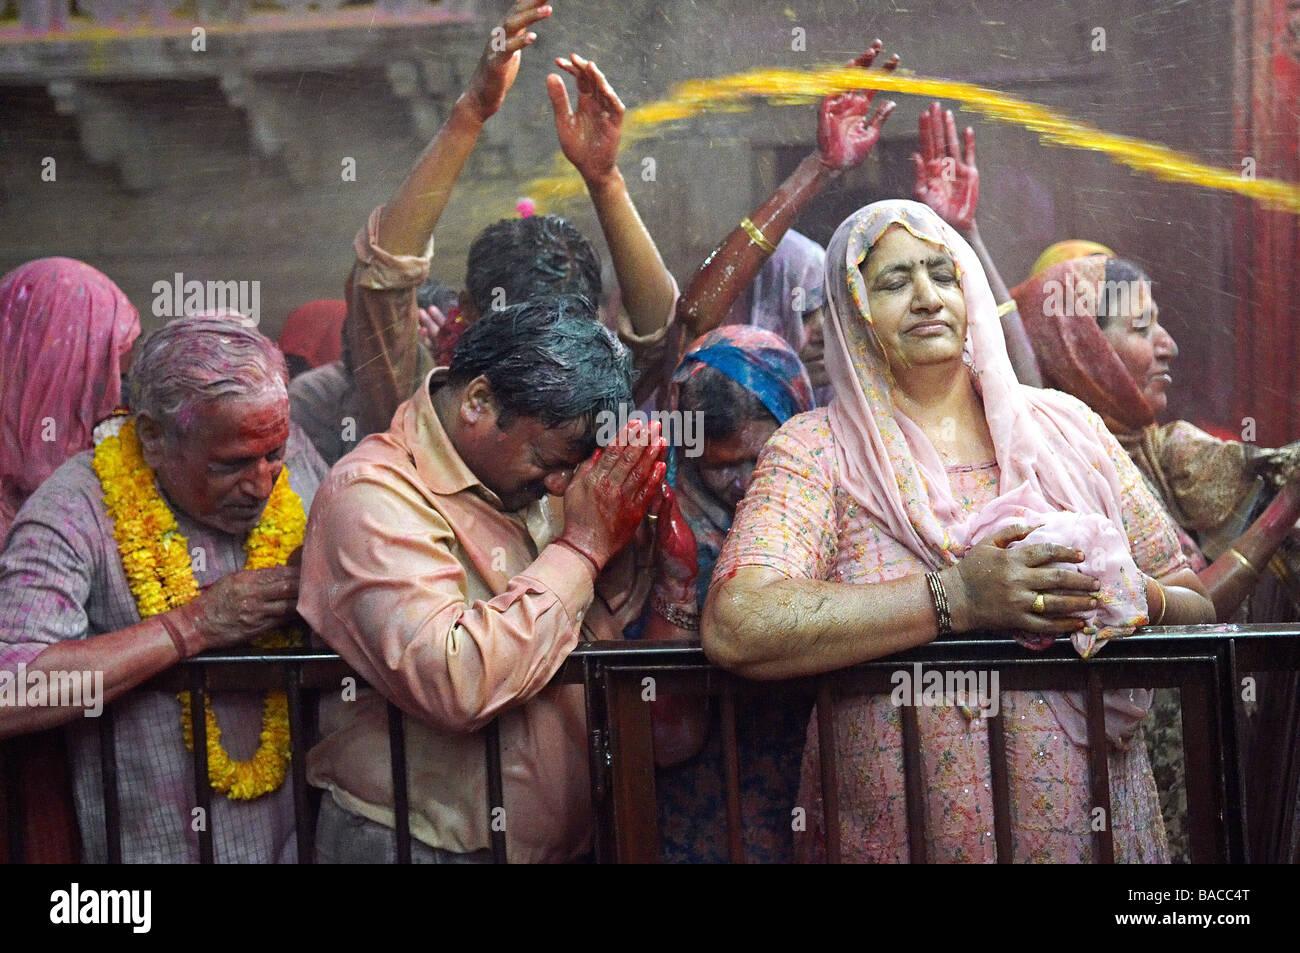 India, Uttar Pradesh, temple dedicated to the God Krishna, Holi Festival, color and Spring festival - Stock Image